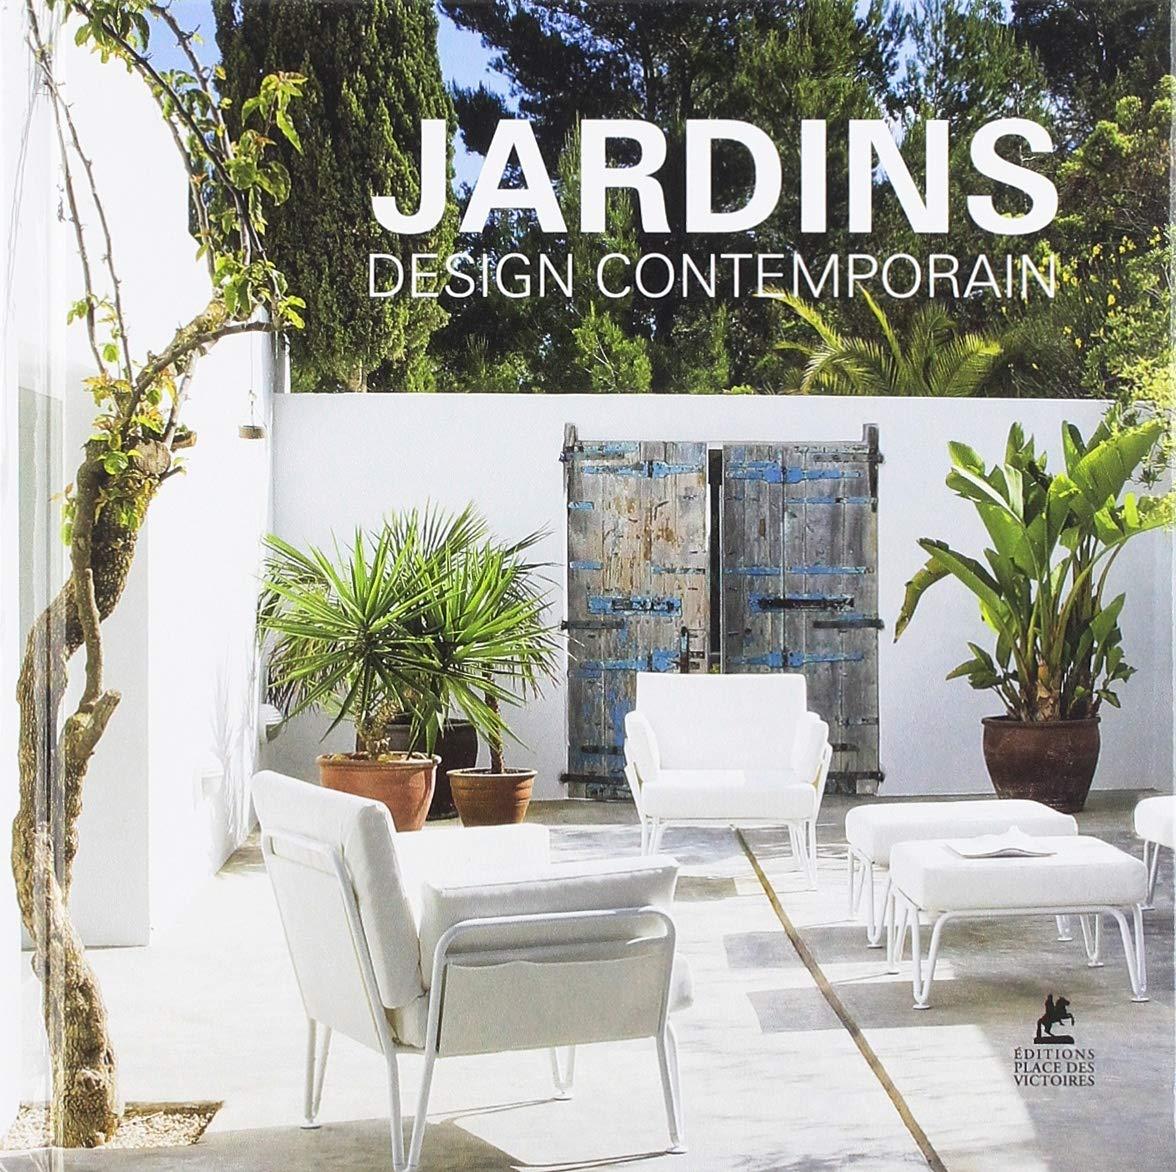 Jardins : Design contemporain: 9782809915778: Amazon.com: Books